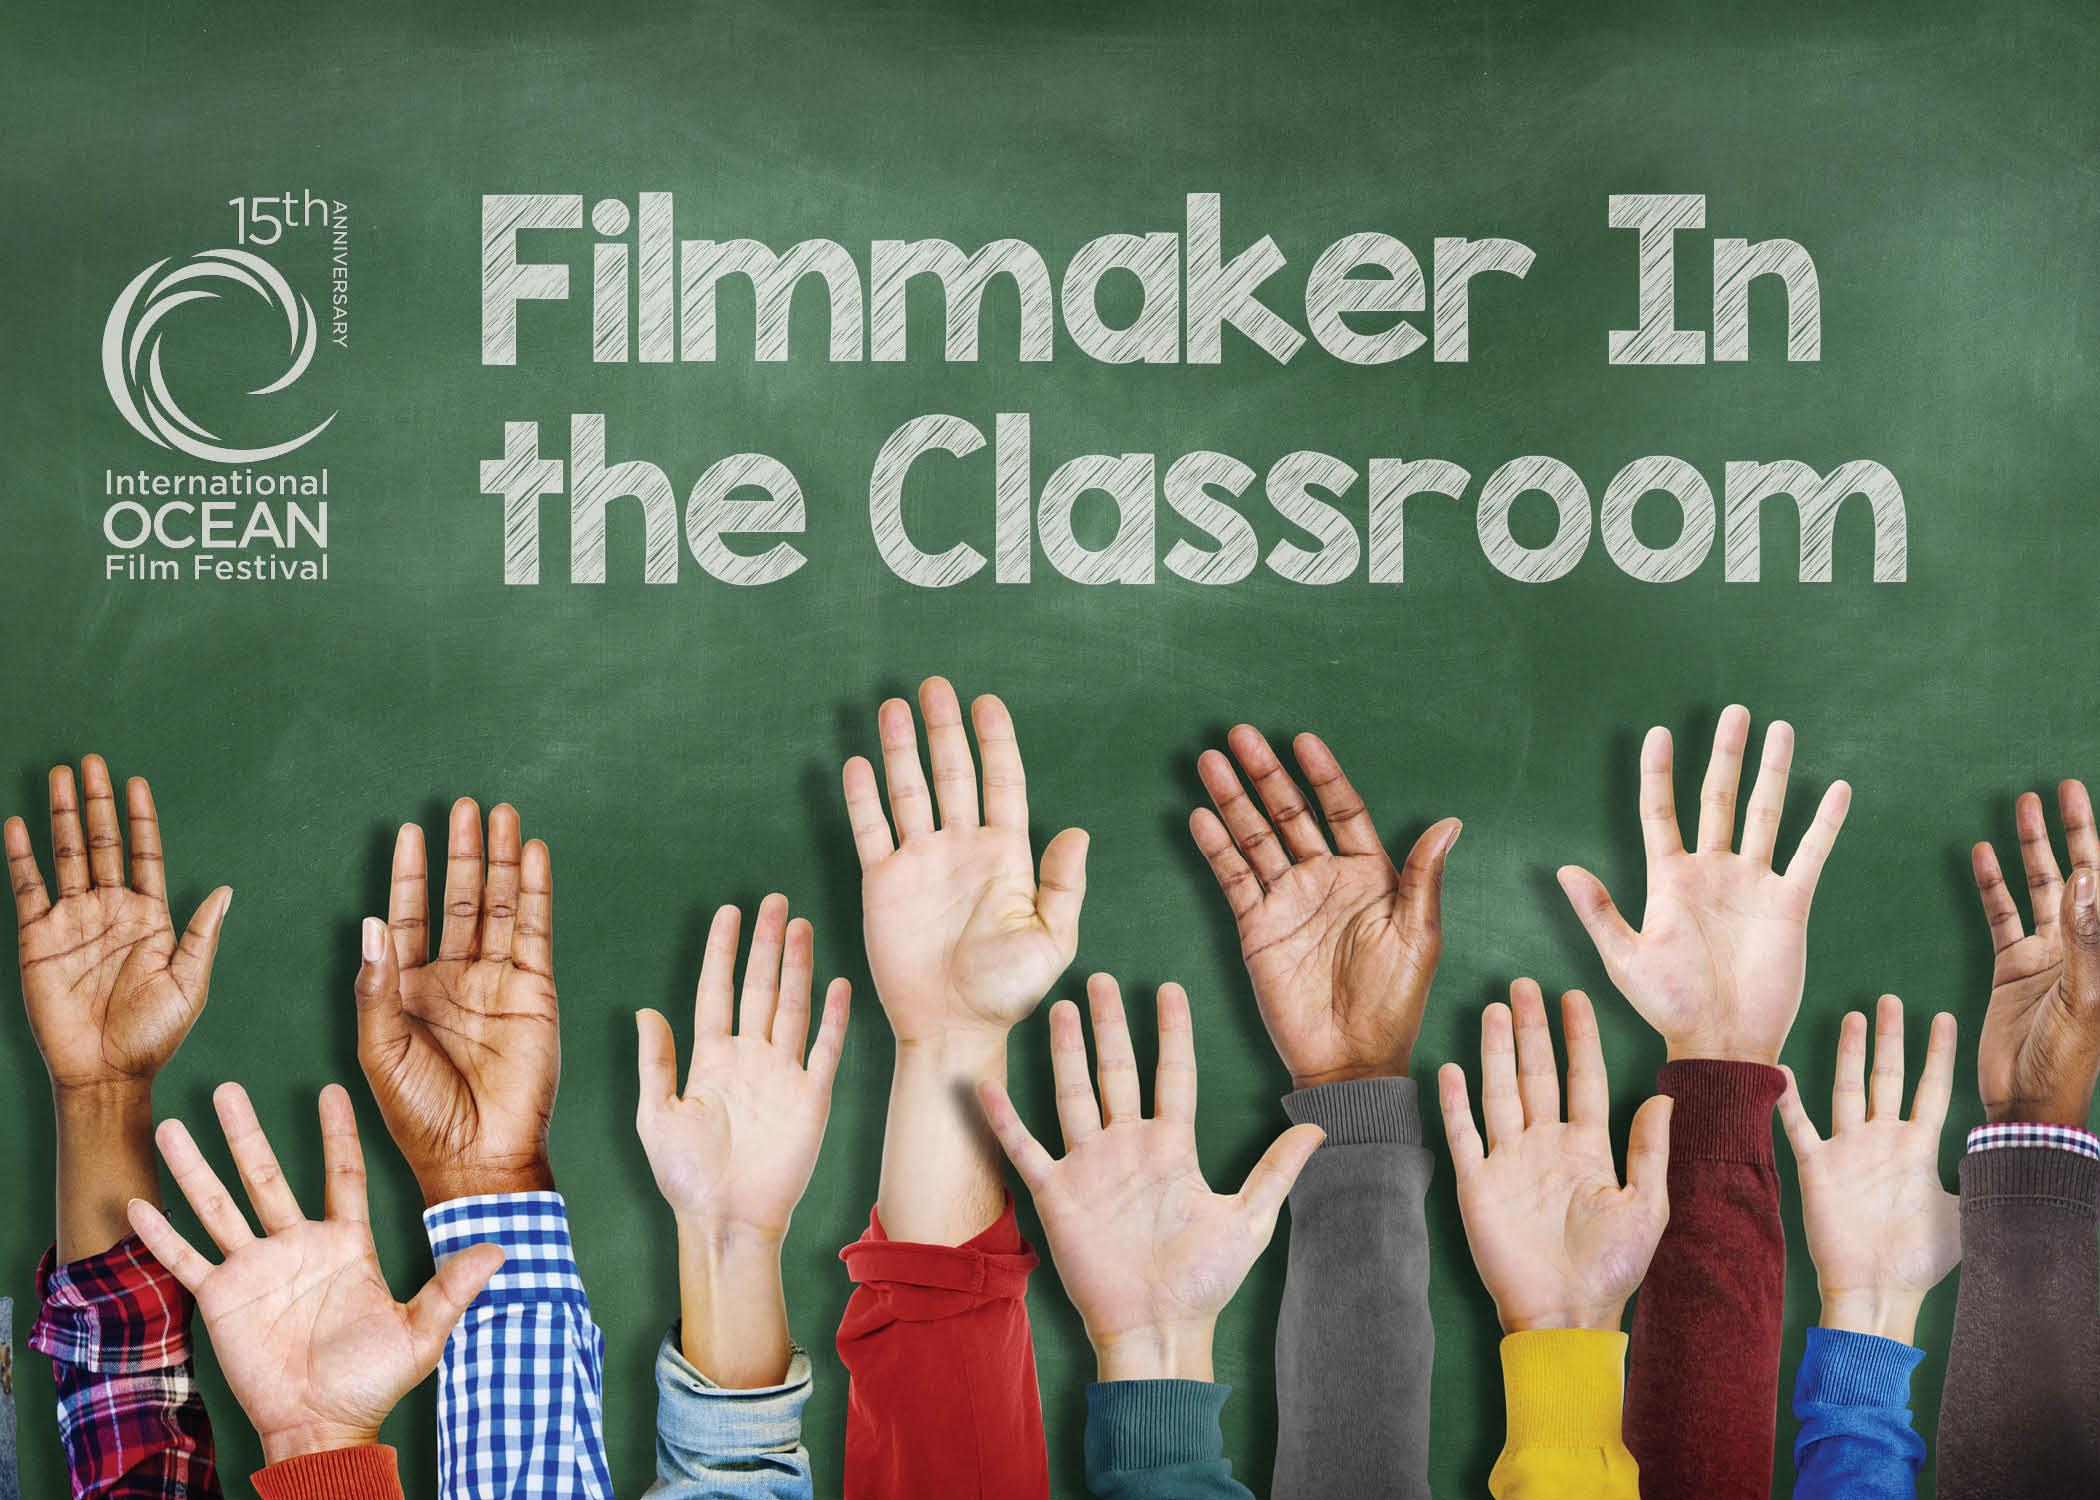 FilmmakerinClassroom_5x7.jpg